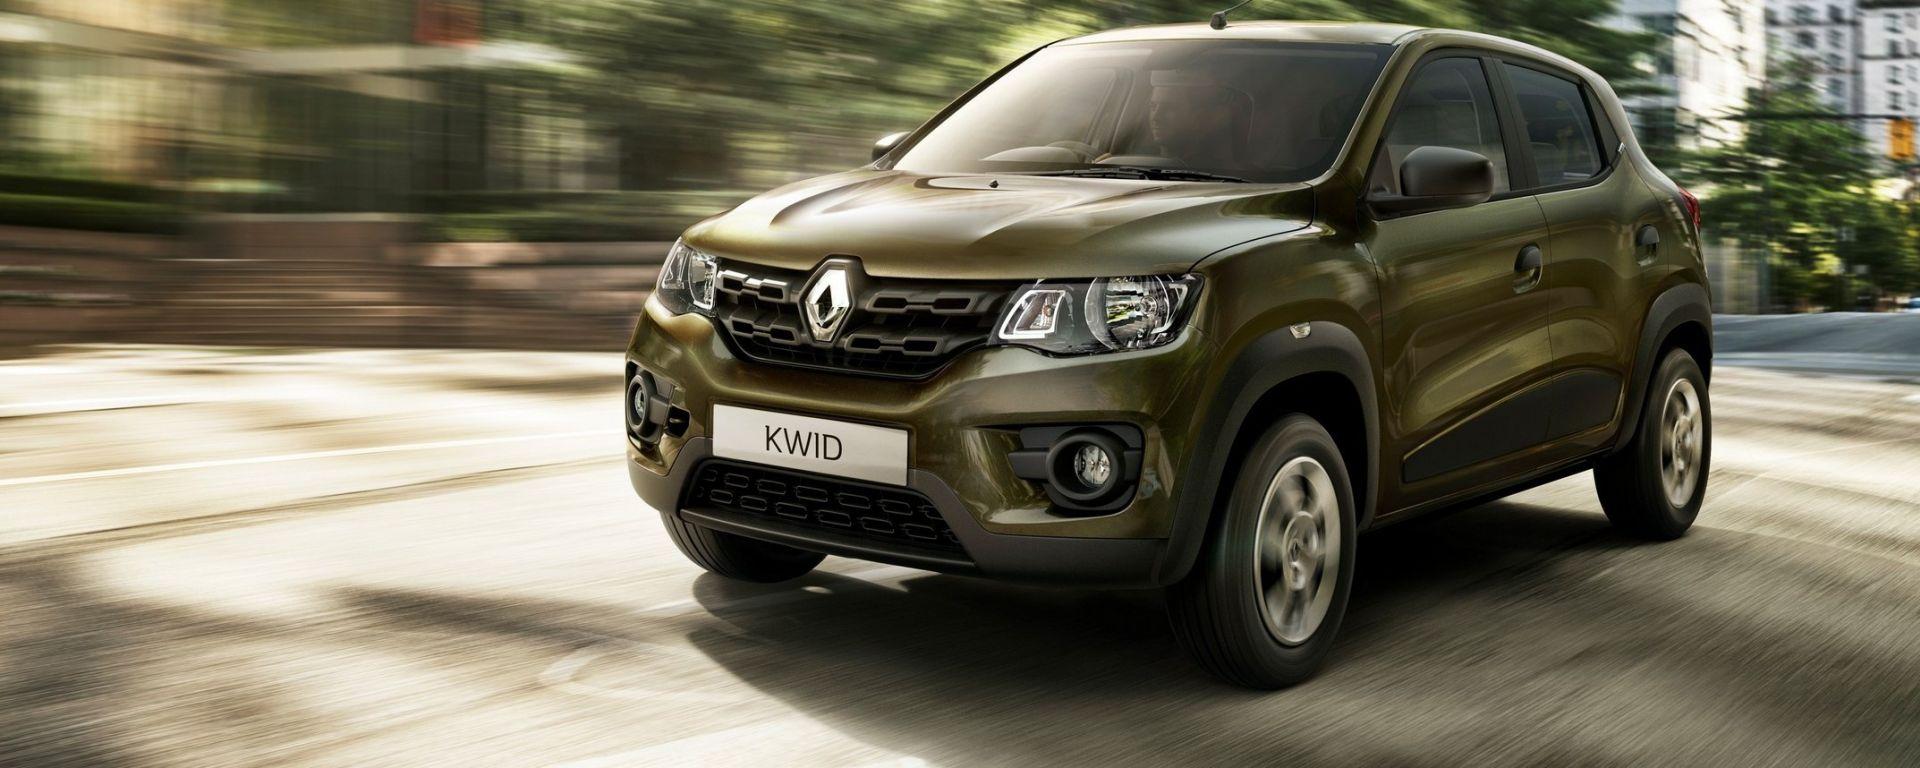 Renault Kwid in Italia